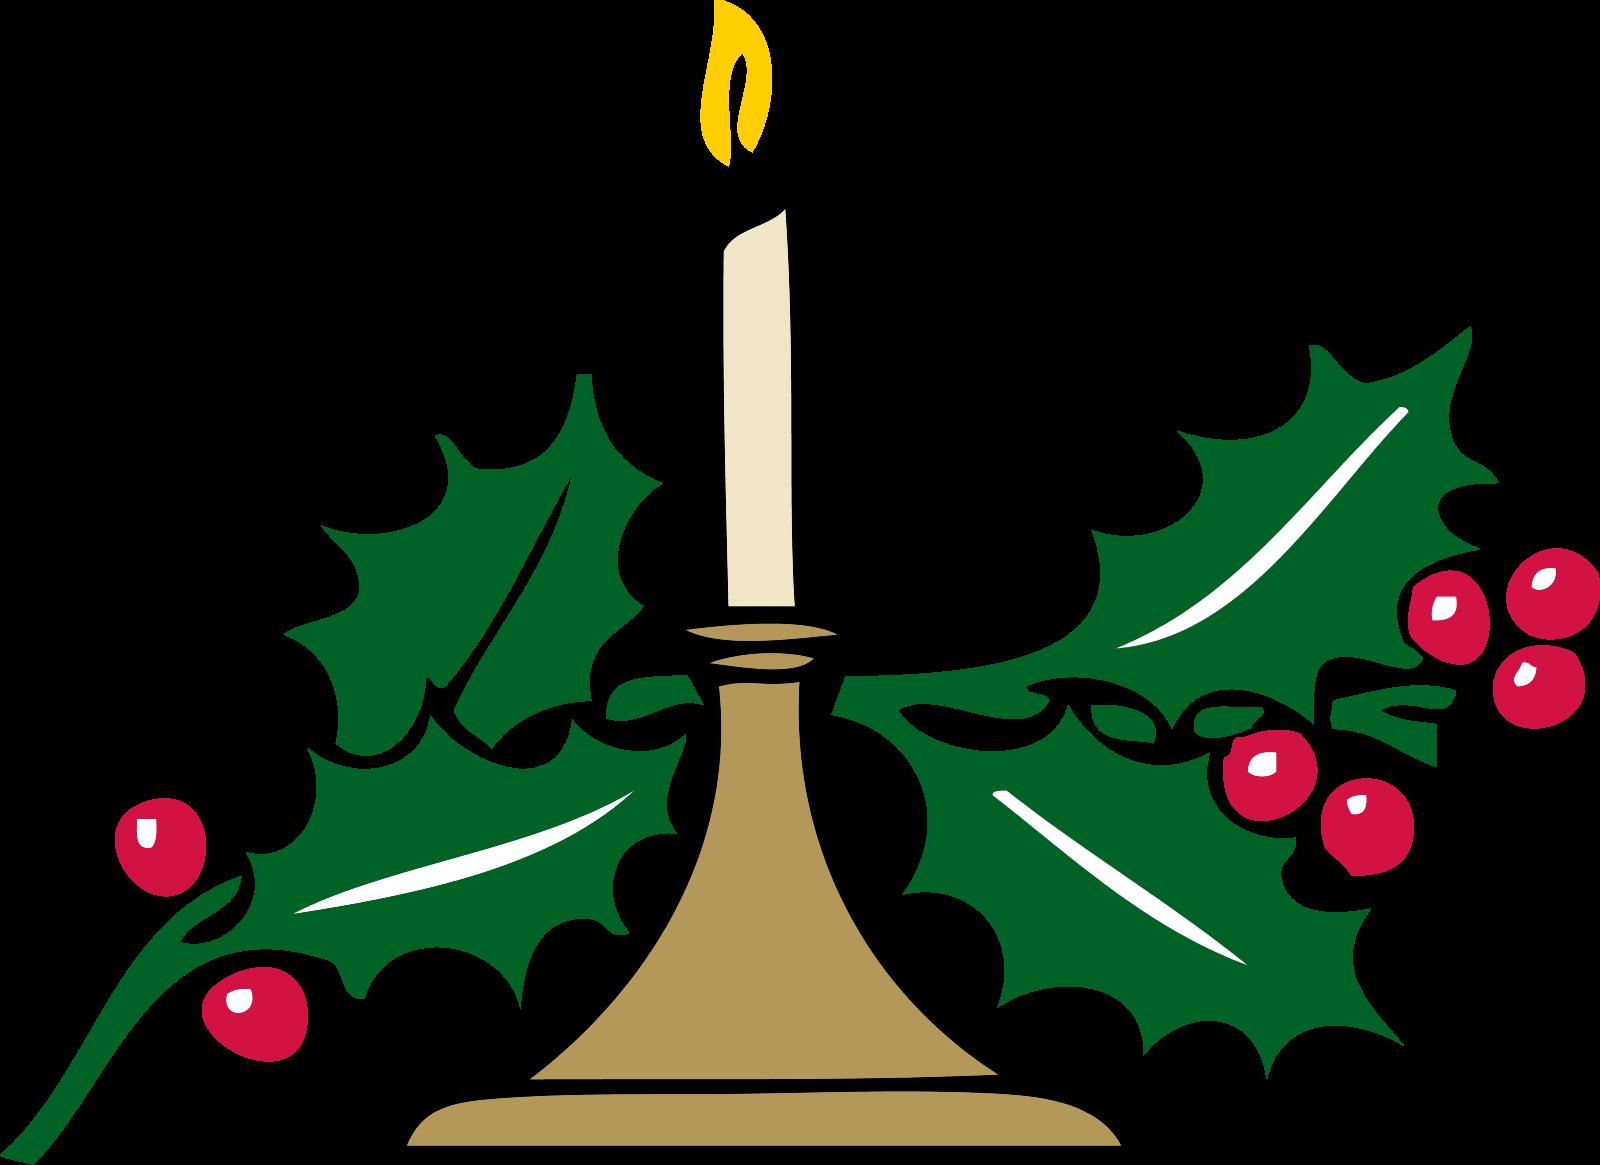 Christmas candle panda free. Poinsettias clipart candlestick